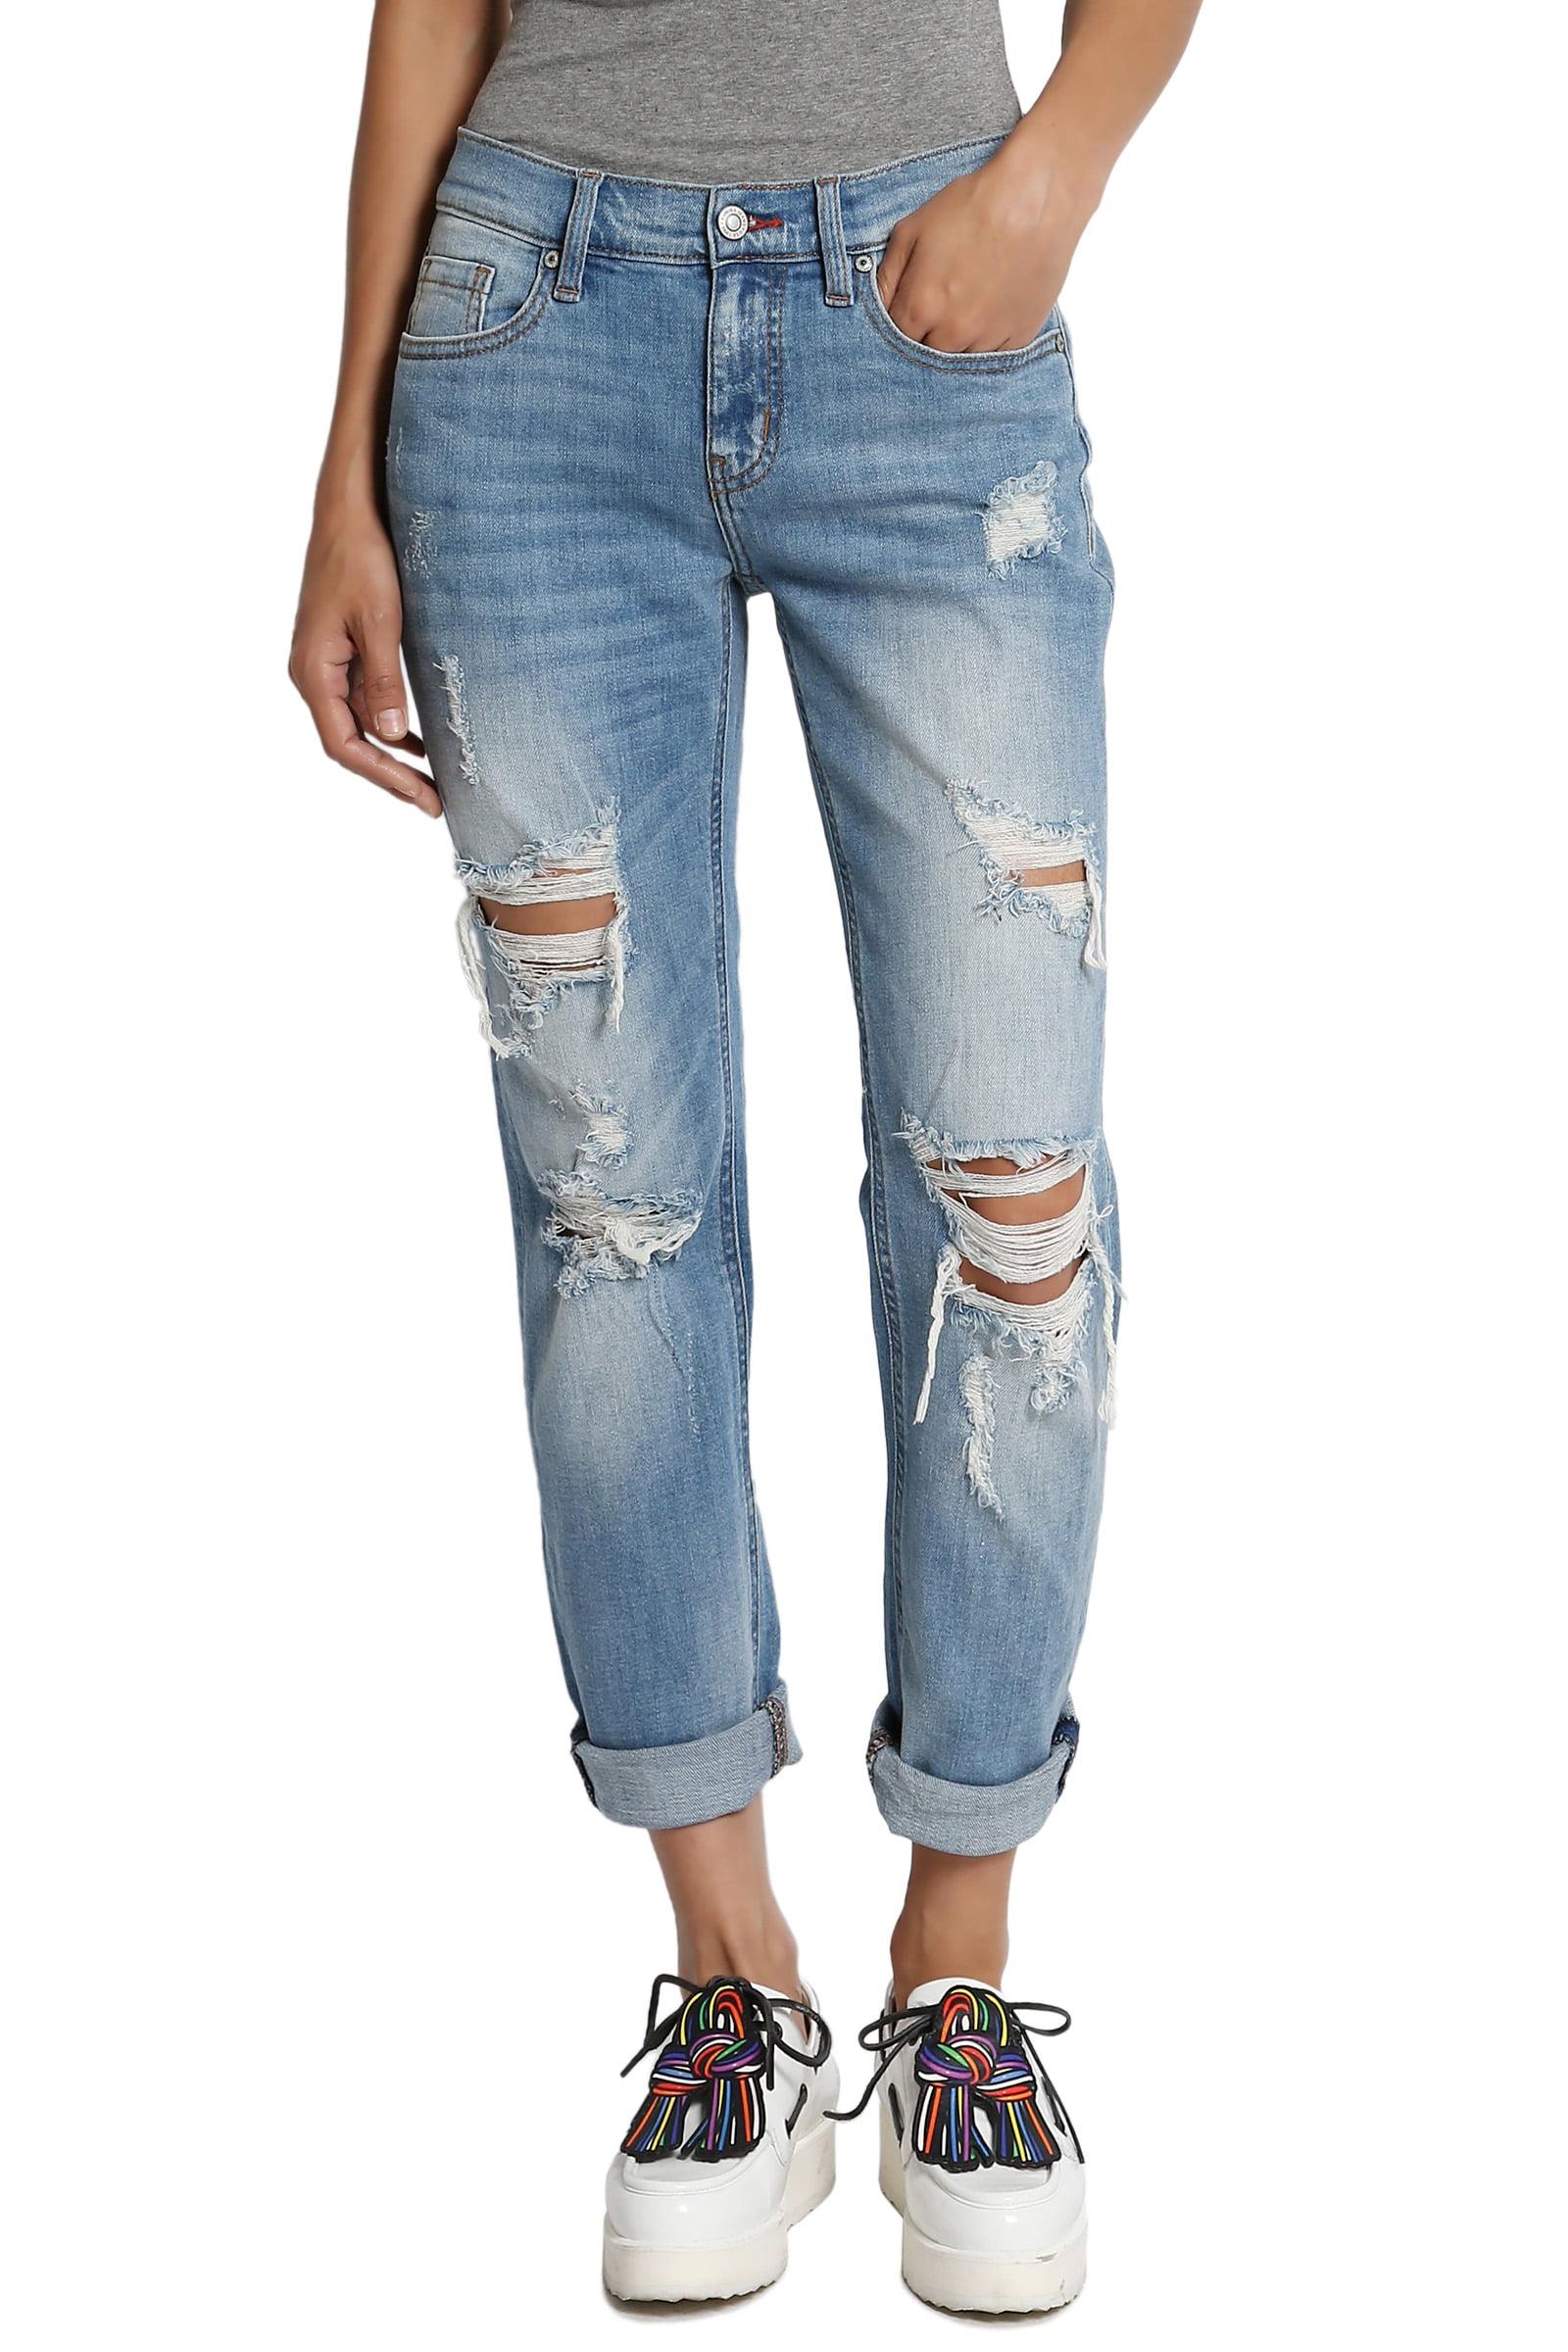 TheMogan Women's Distressed Washed Denim Mid Rise Boyfriend Jeans Medium 15